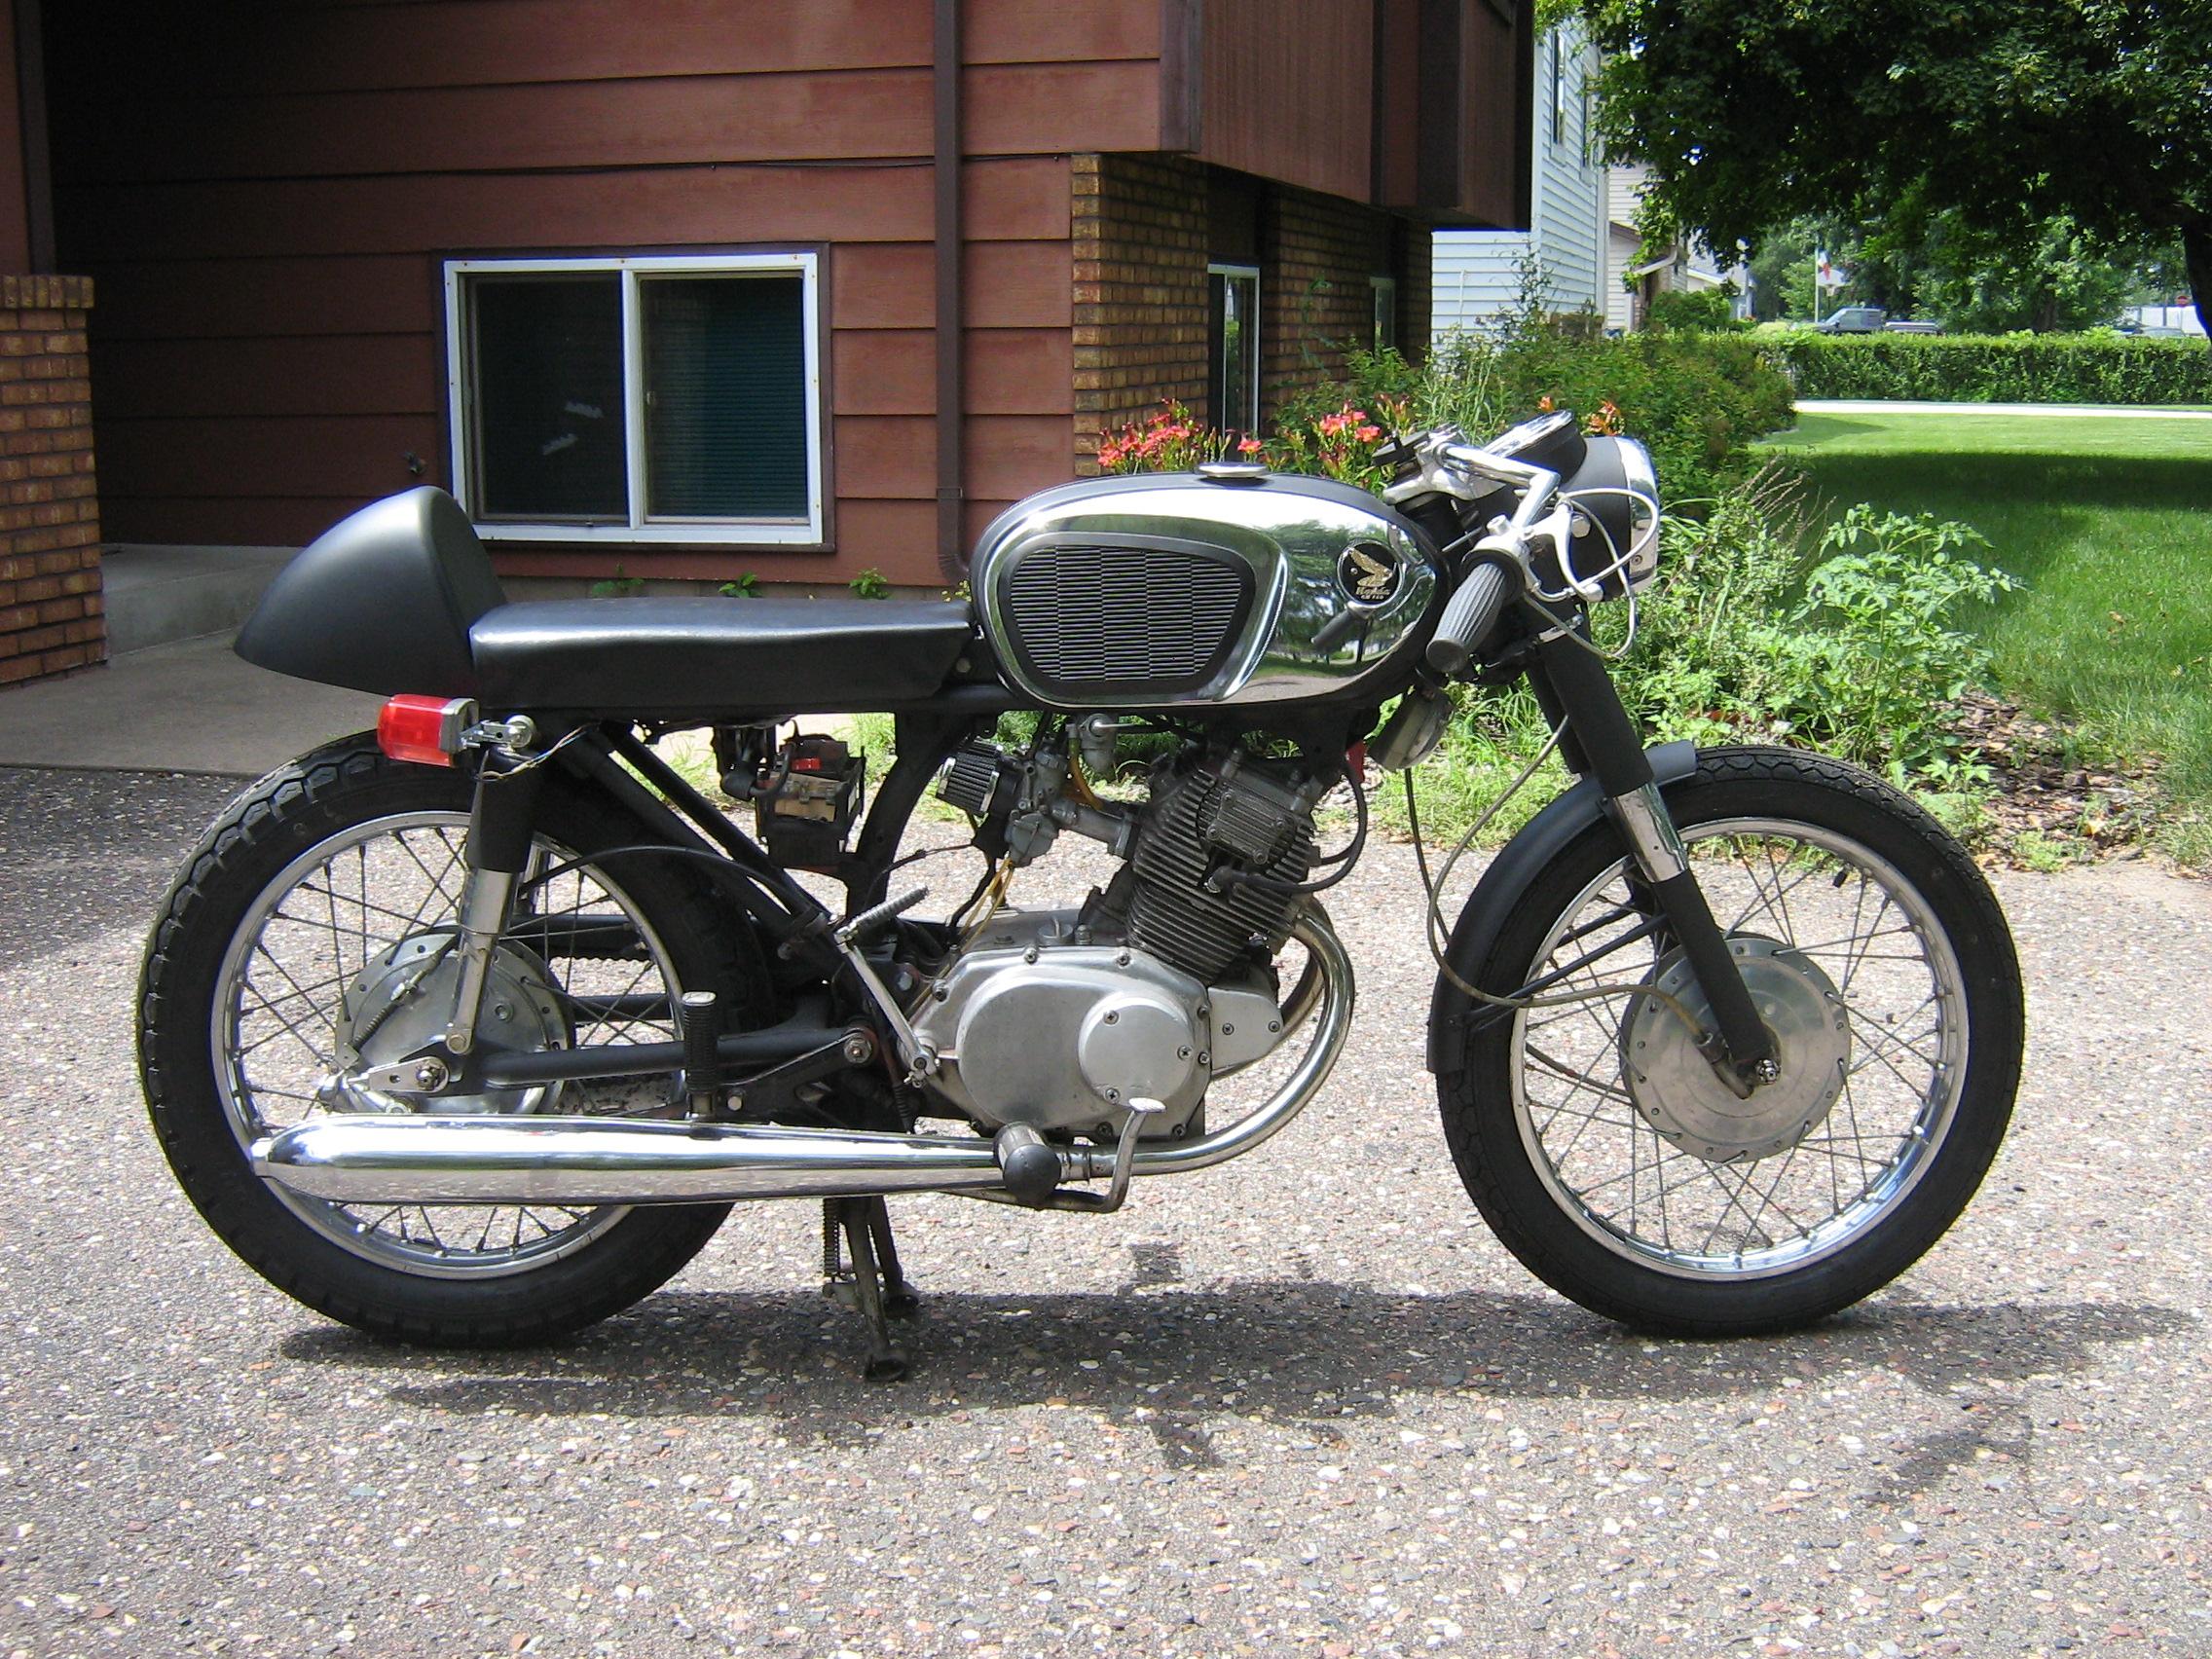 1966 Honda CB160 Cafe Craigslist Find